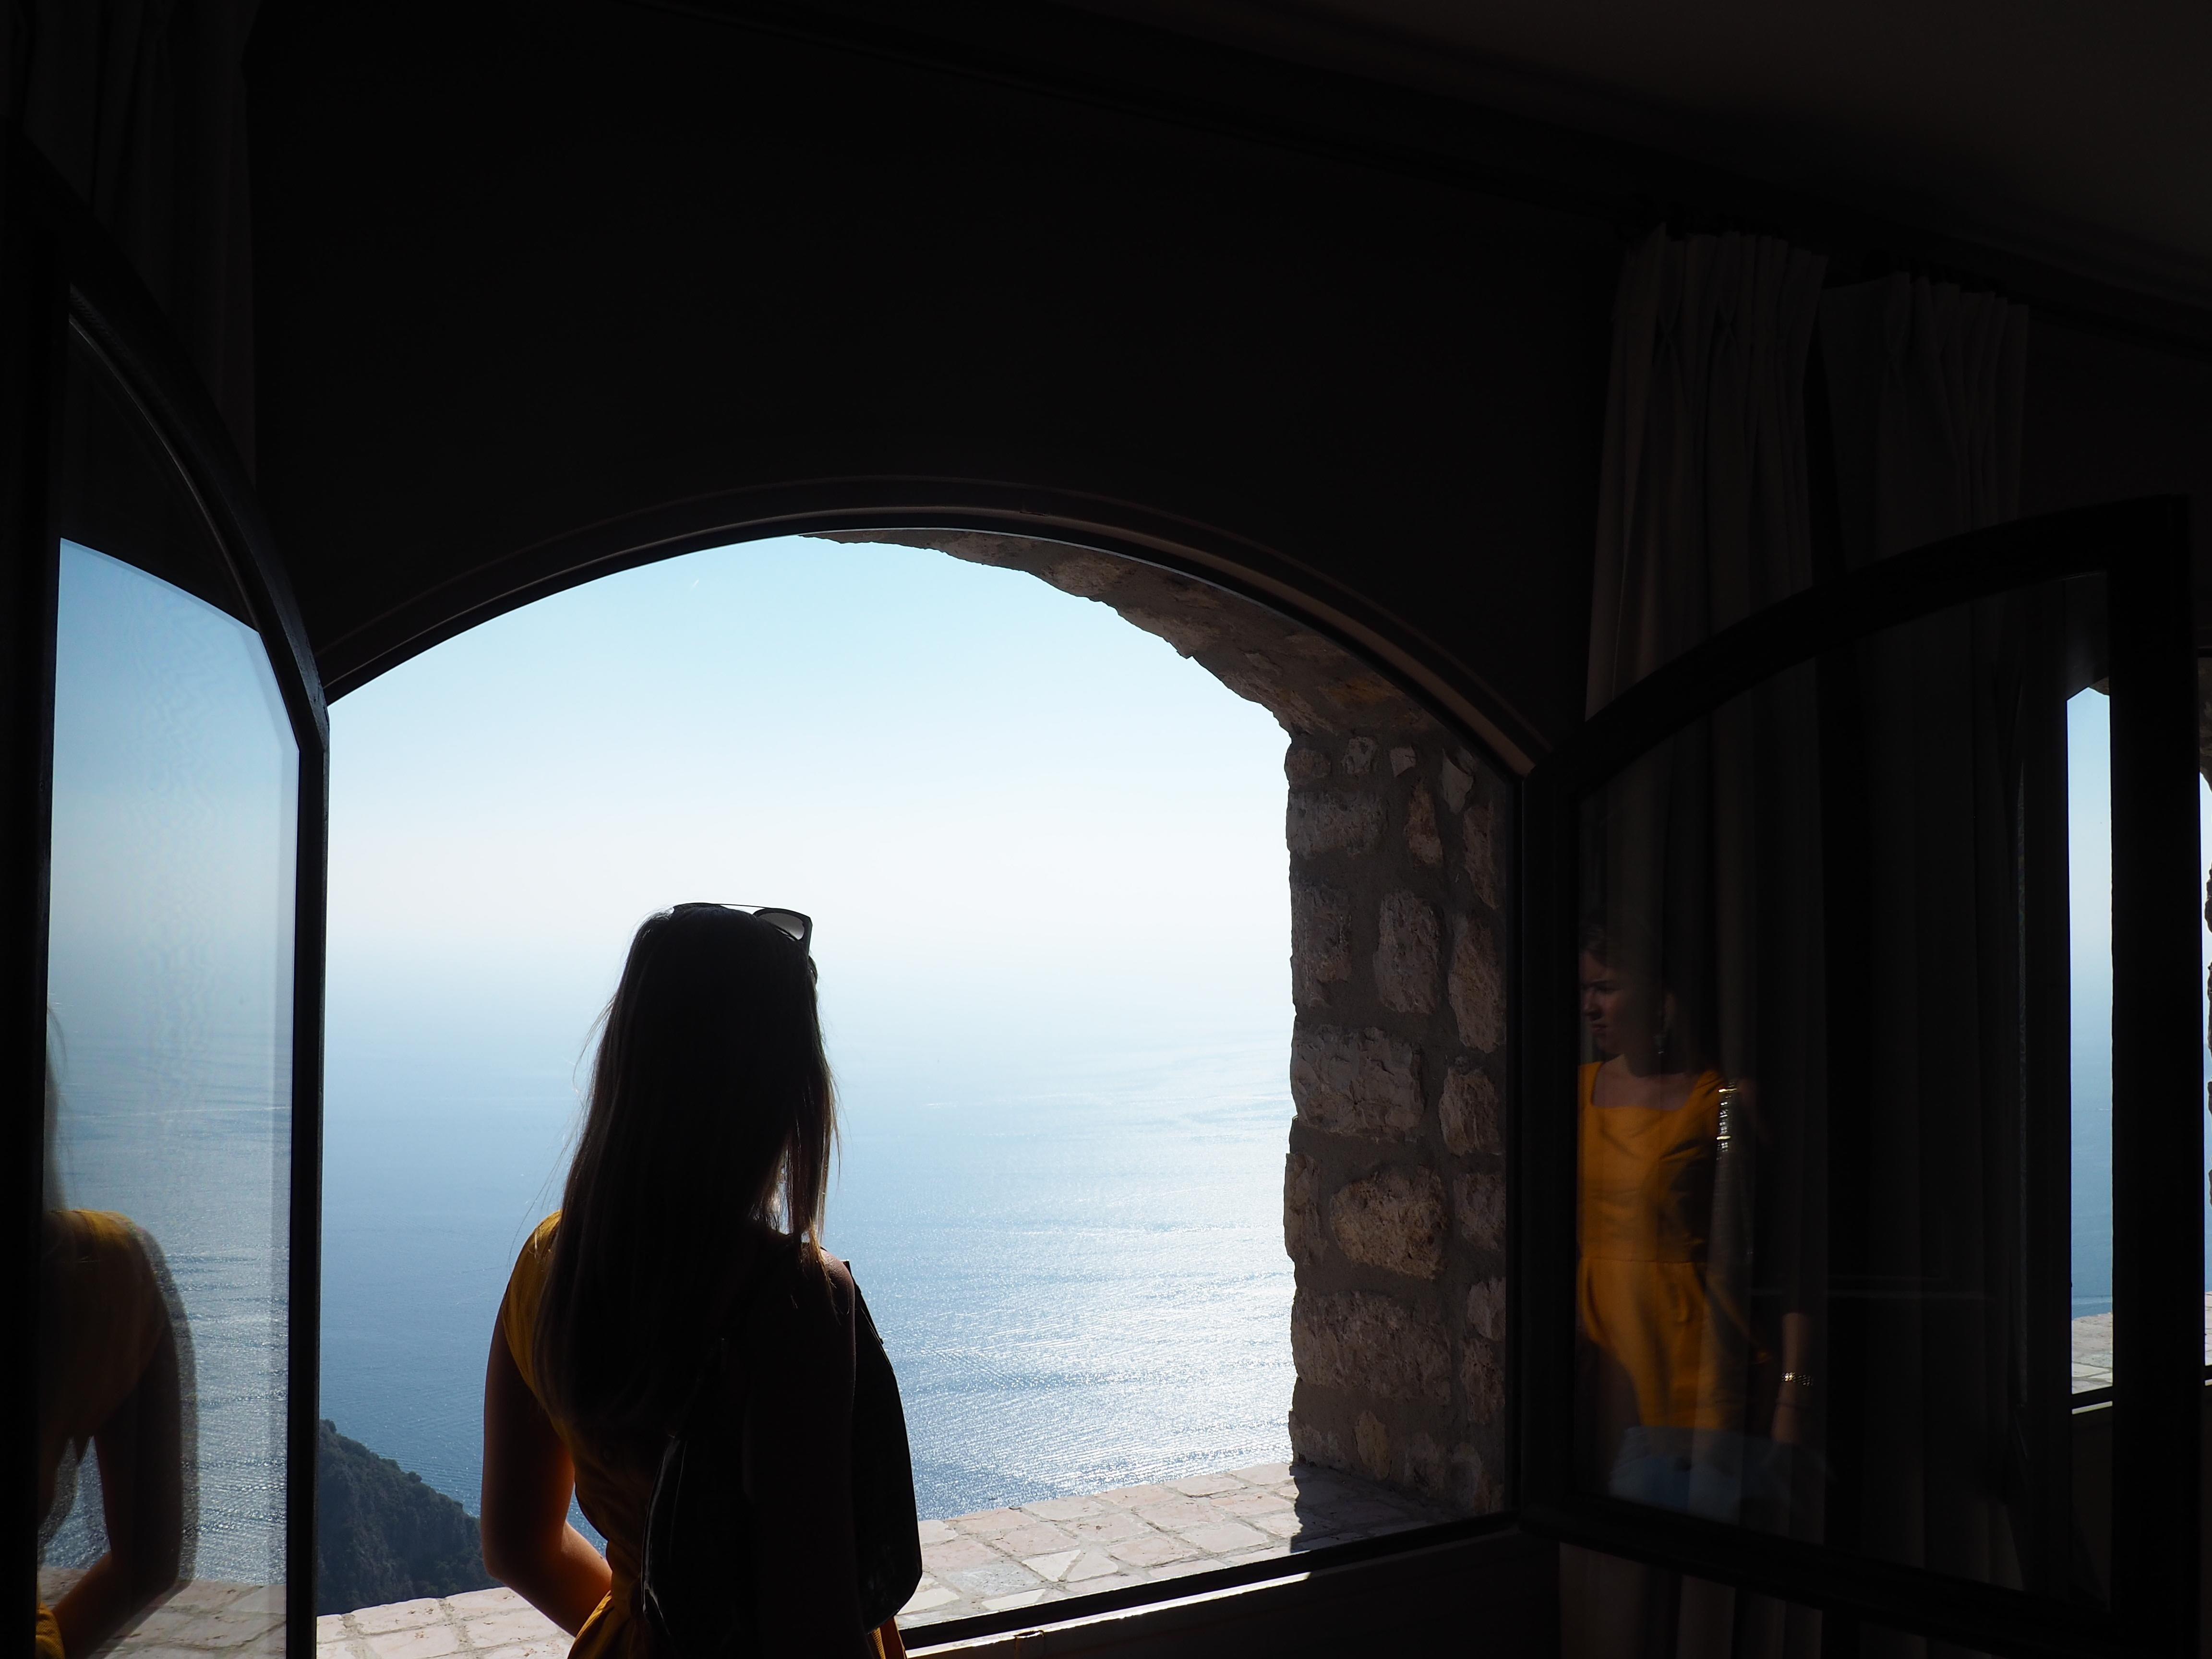 @exotiktraveler's cover photo for 'Hotel Review: Chateau Chevre D'Or, Eze - EXOTIKTRAVELER'